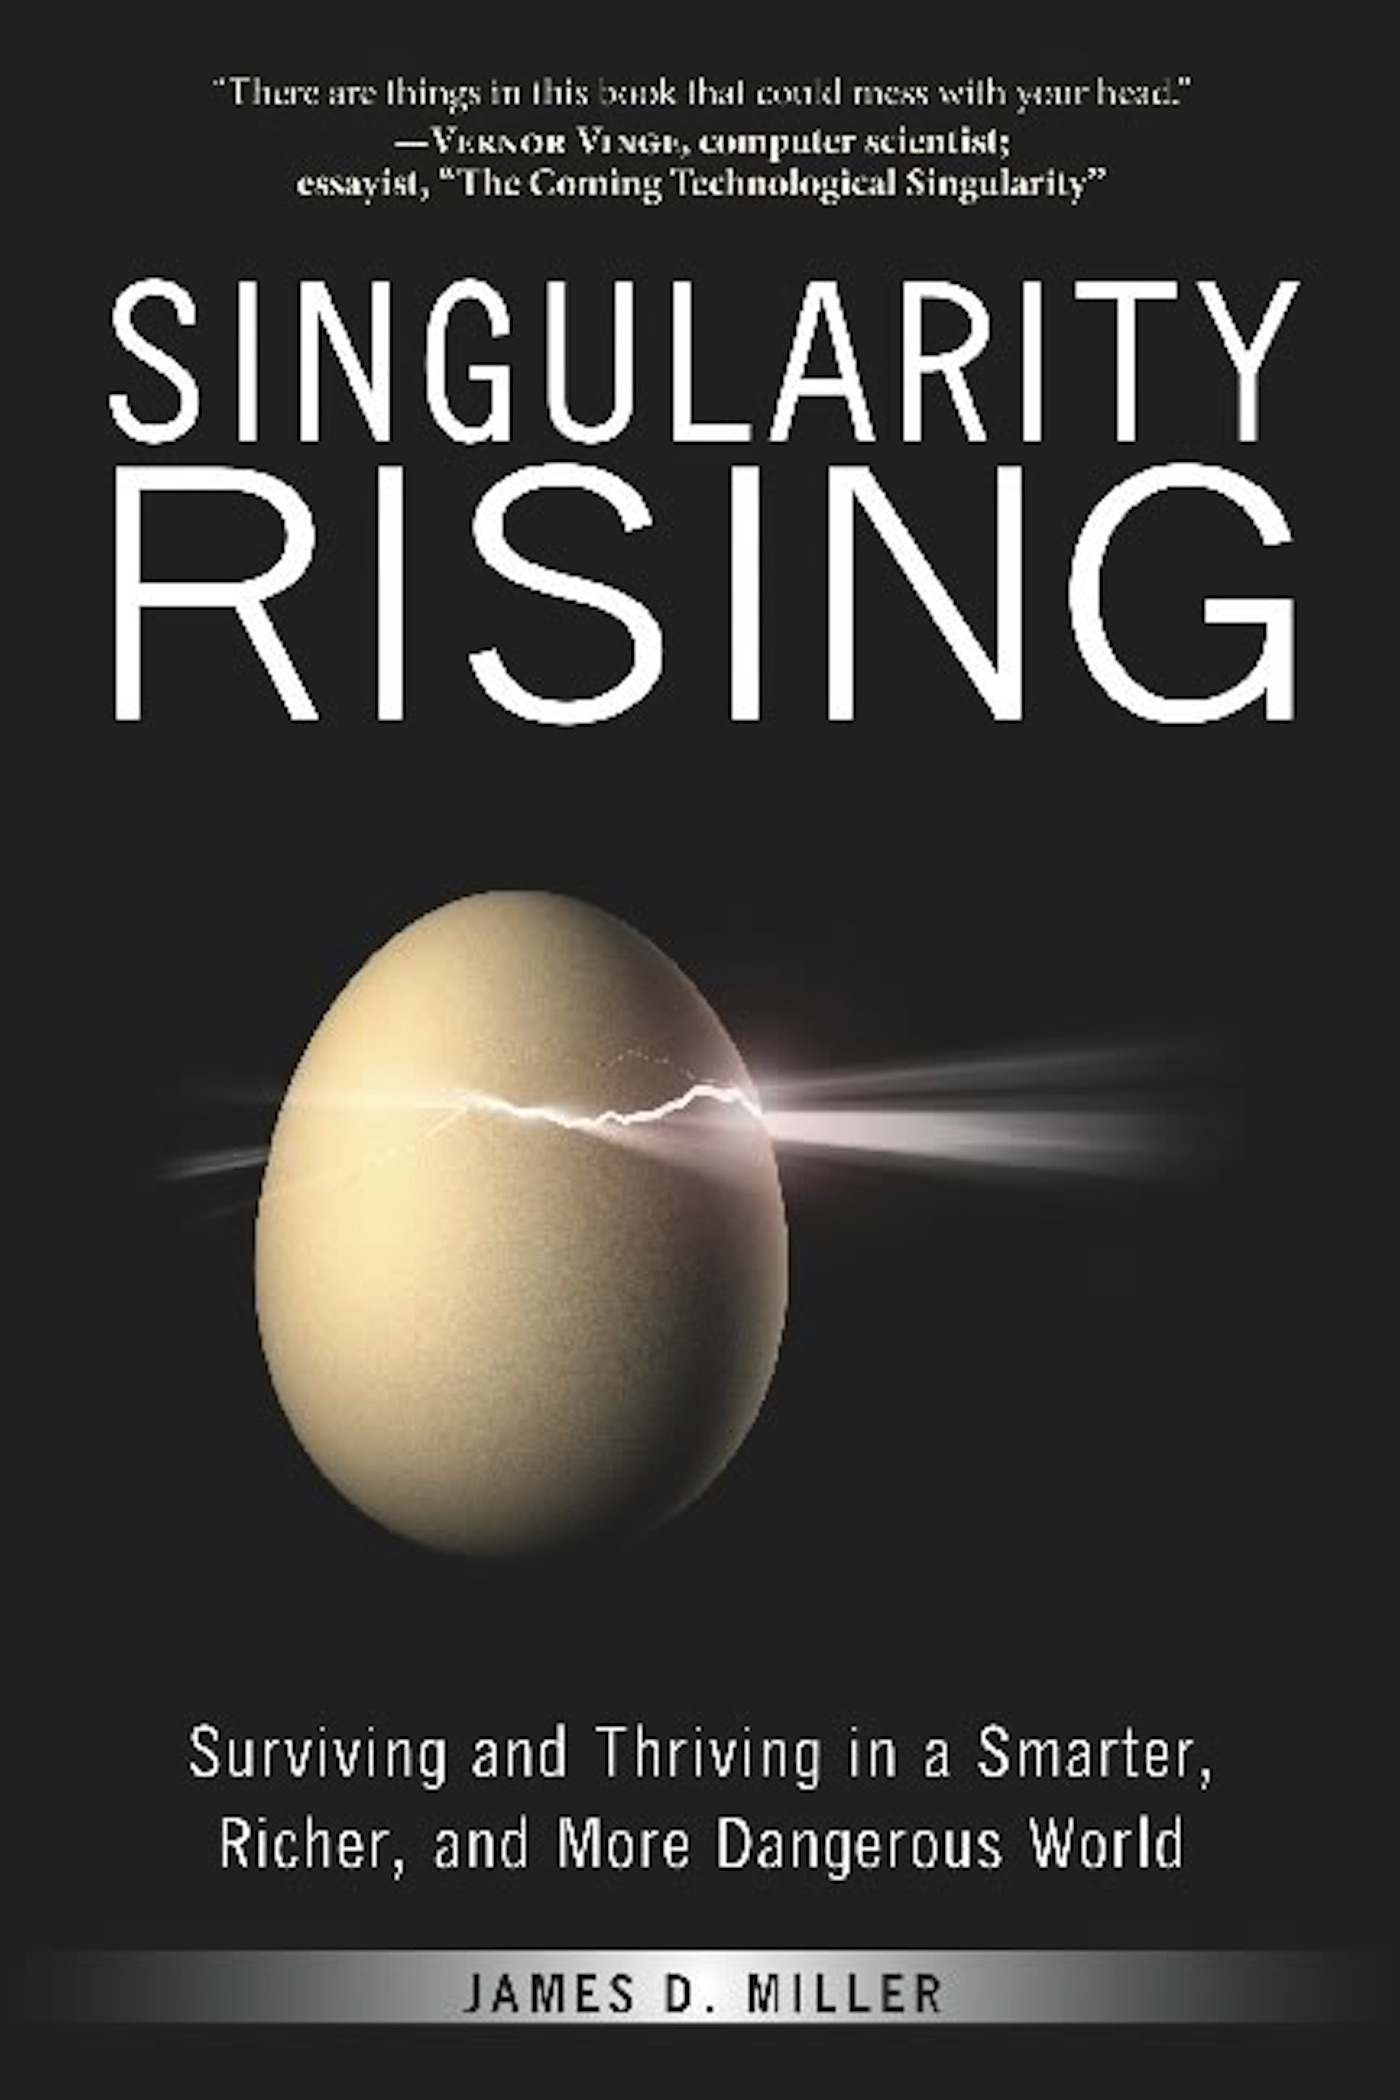 Book Cover of Singularity Rising